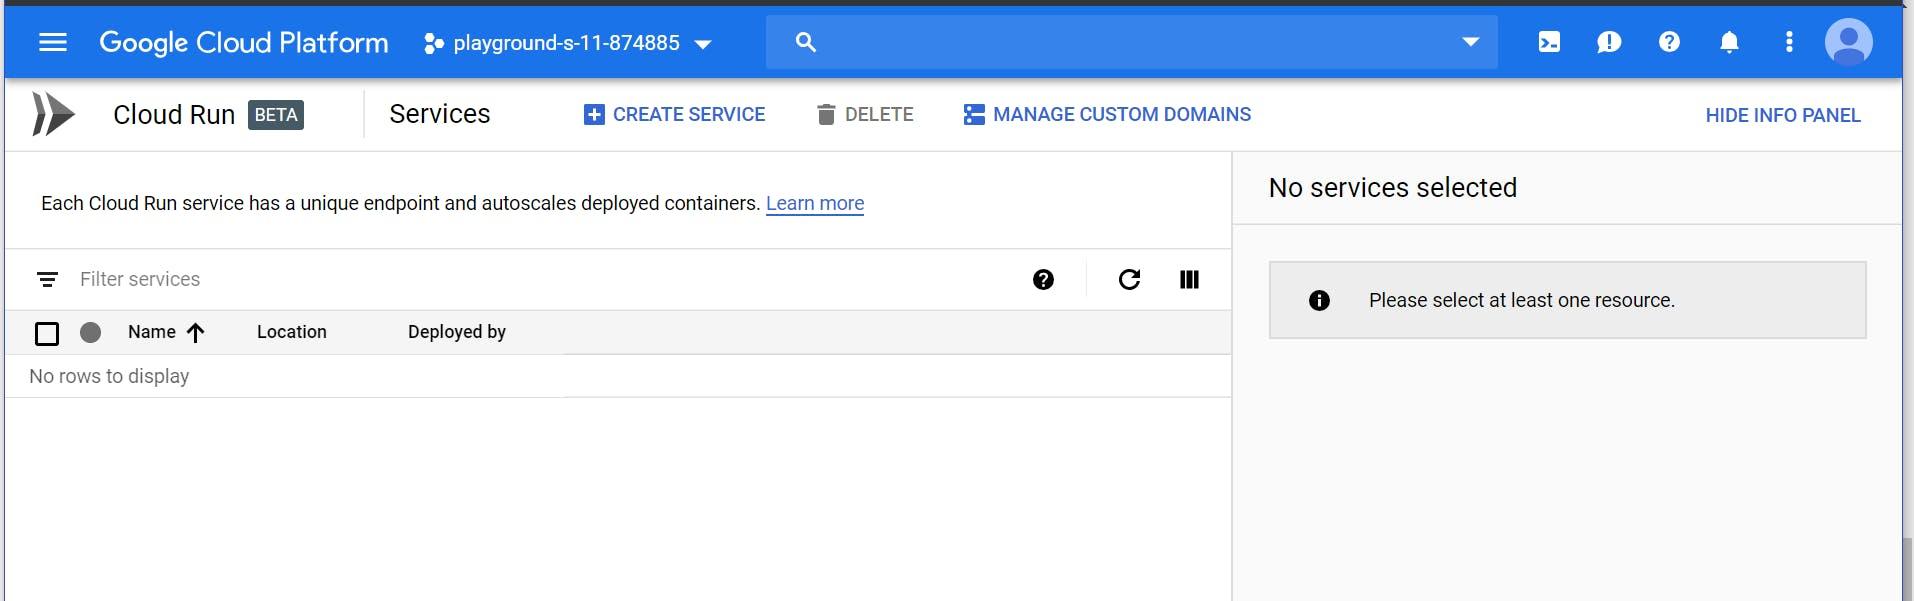 Create Service Page